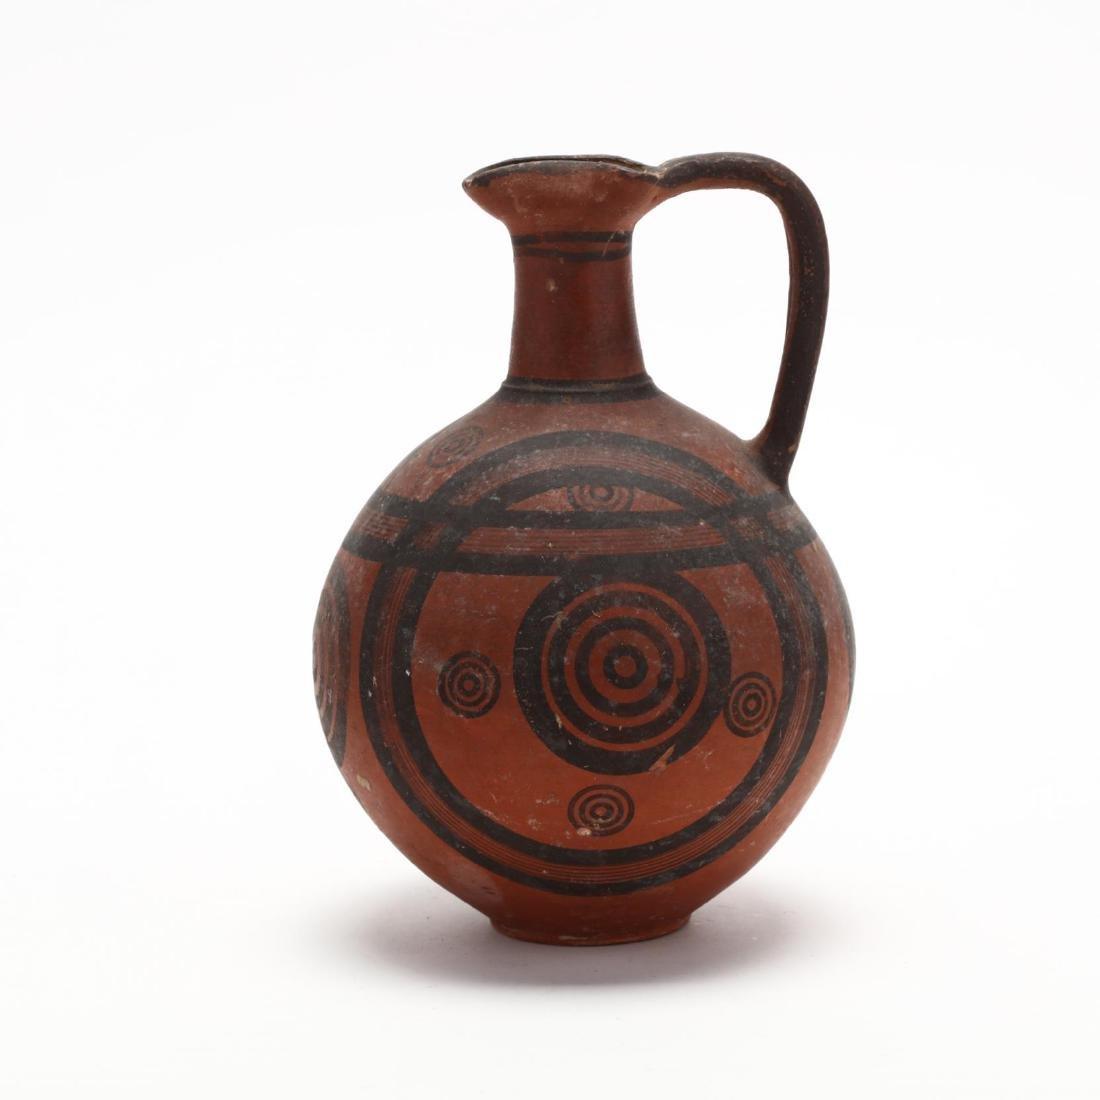 Cypro-Archaic Red Ware Jug, Ex. Cesnola Collection - 3